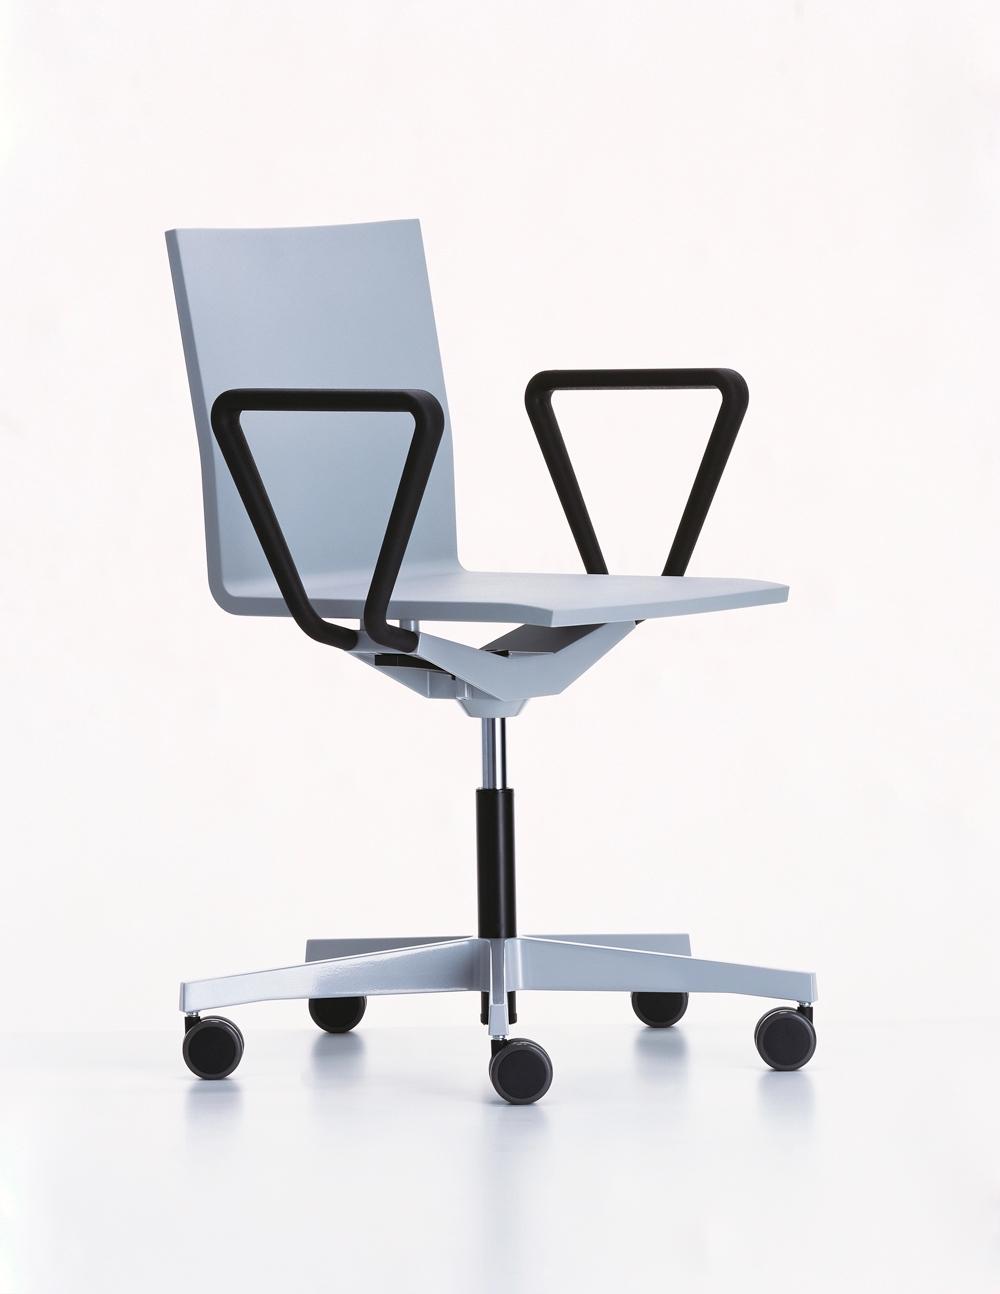 vitra 04 studio chair gr shop canada. Black Bedroom Furniture Sets. Home Design Ideas